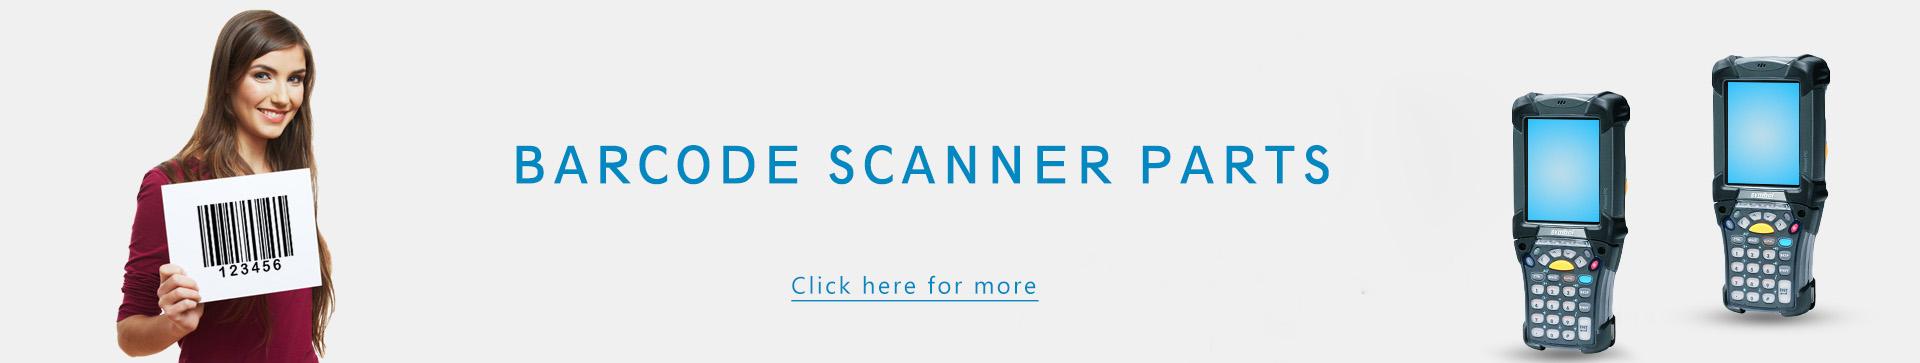 barcode scanner repair parts